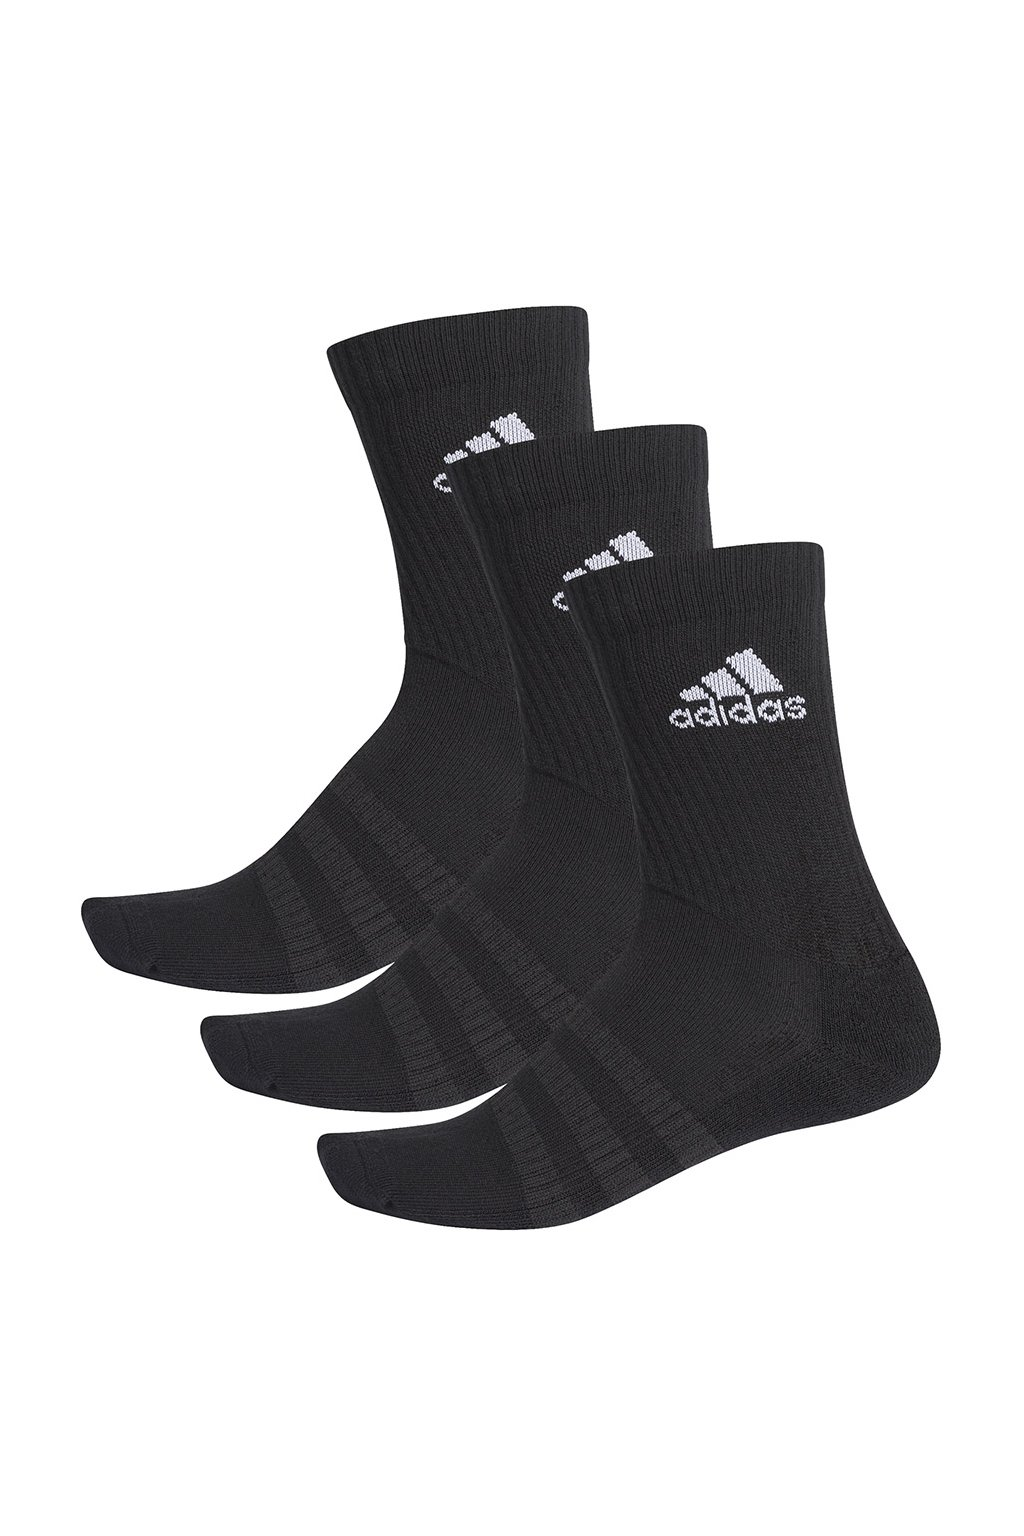 Ponožky Adidas Cushlined Crew 3PP čierne DZ9357